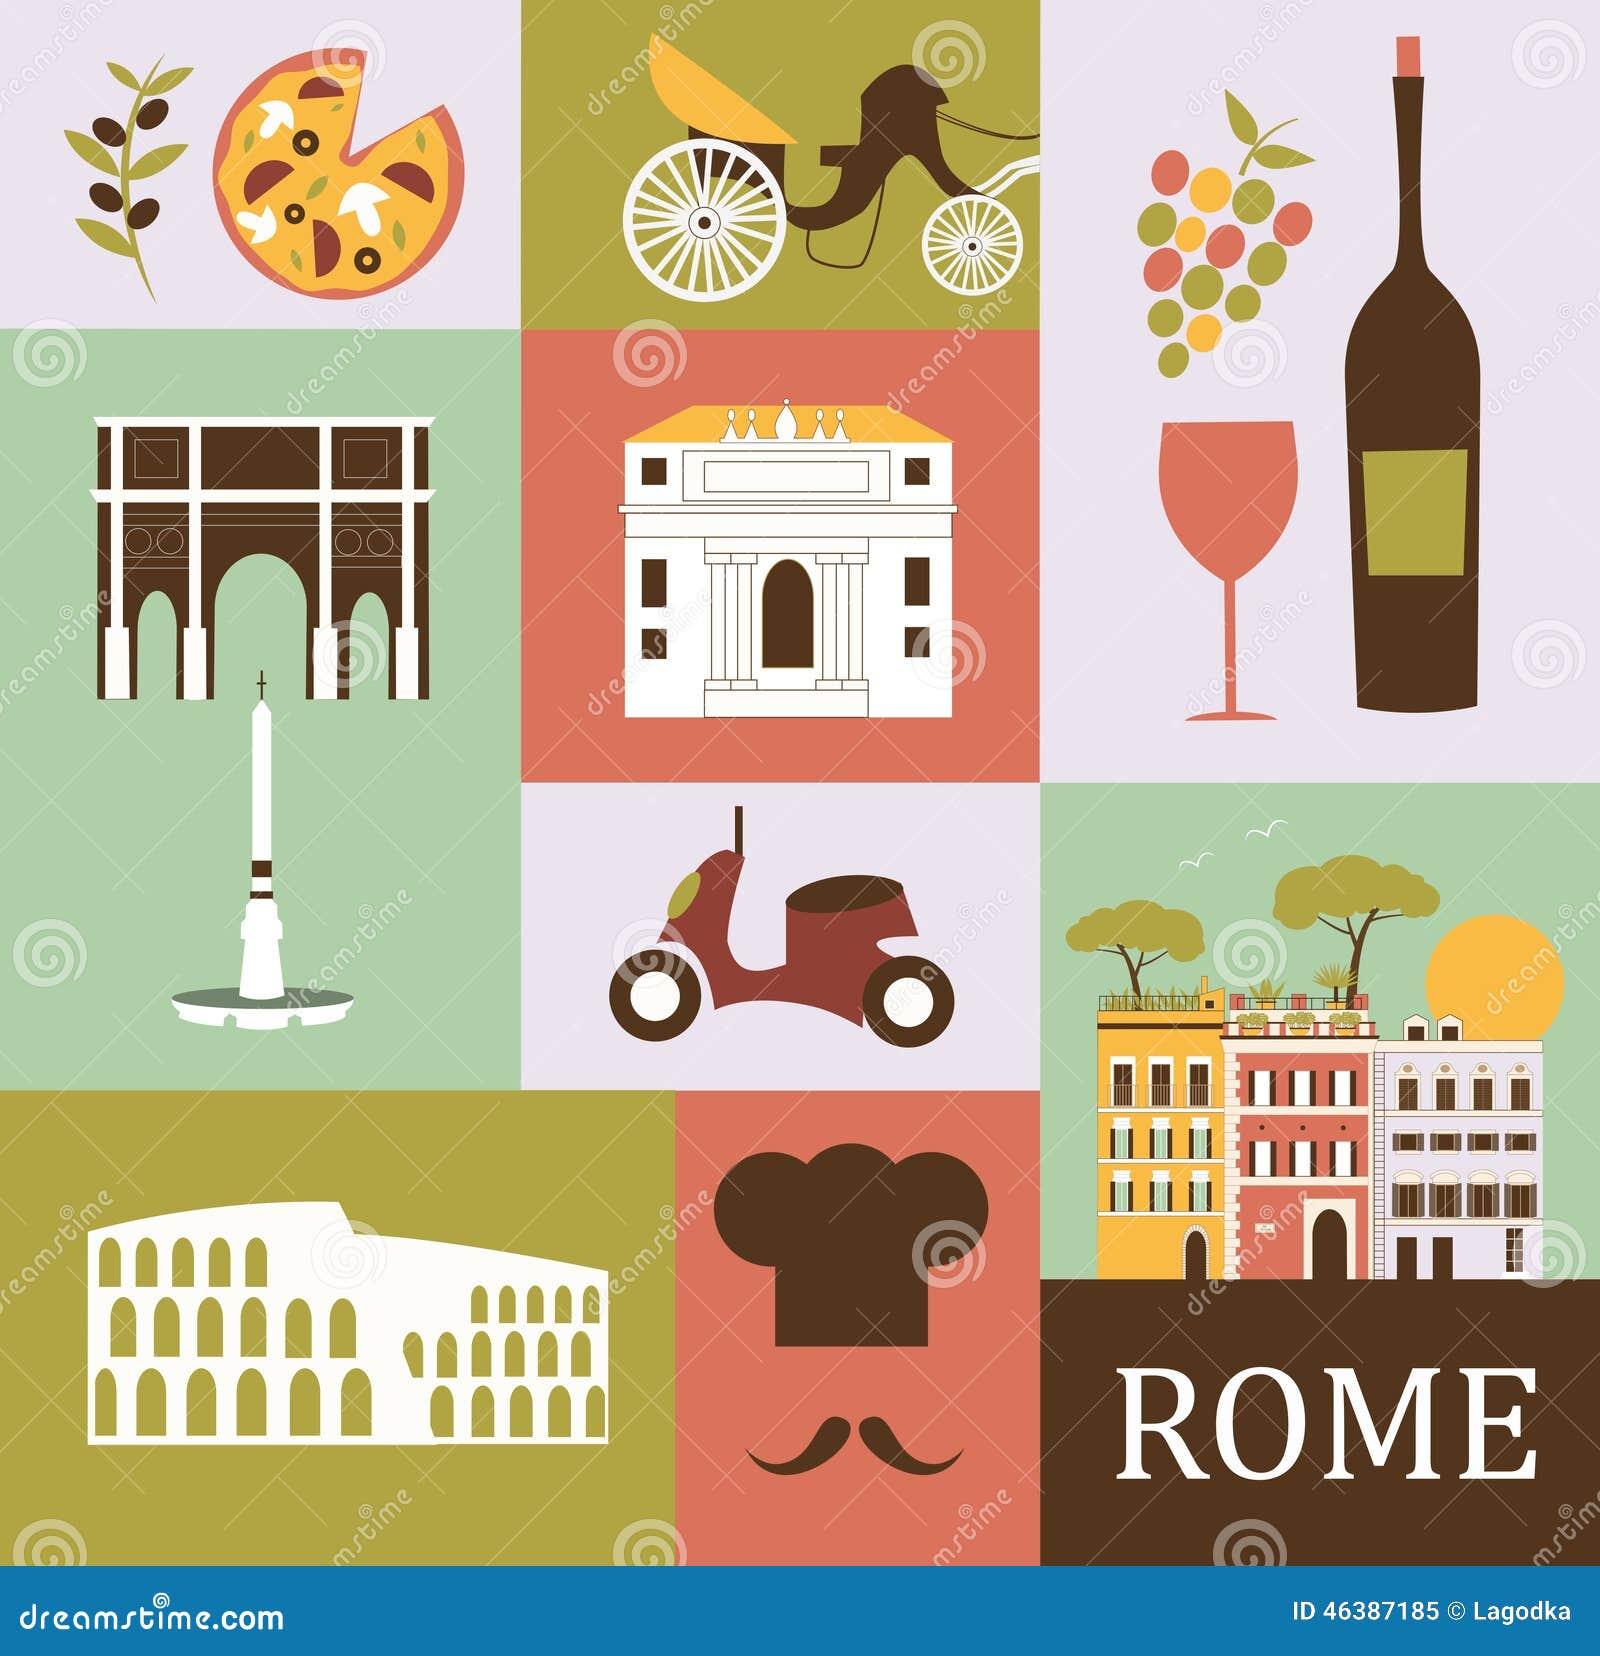 Rome stock illustrations 11457 rome stock illustrations symbols of rome symbols of rome in bright colors royalty free stock photo biocorpaavc